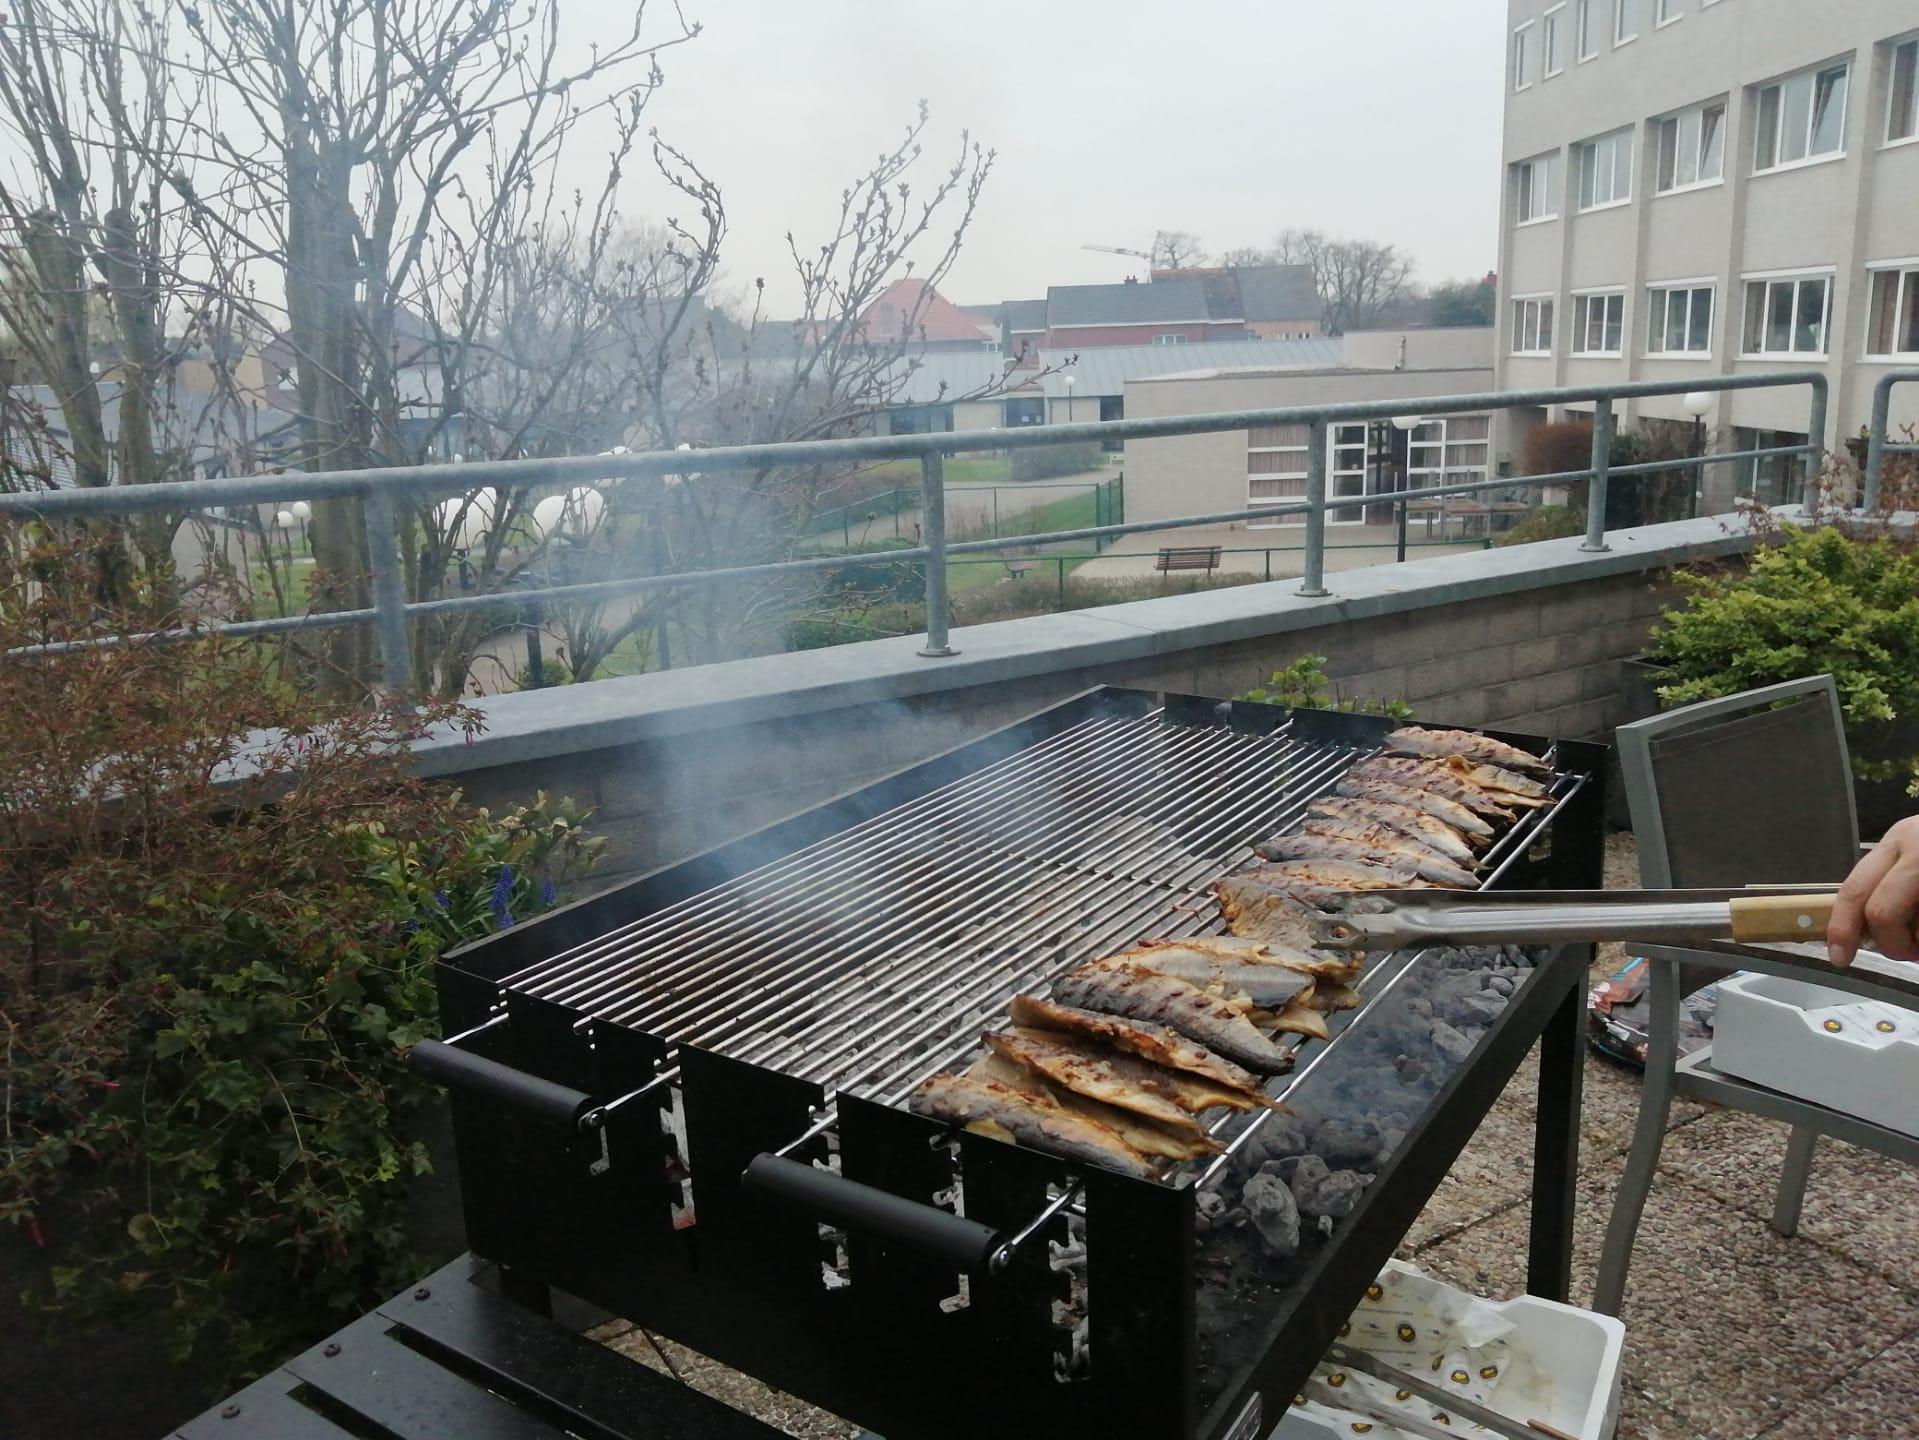 Haringenbak